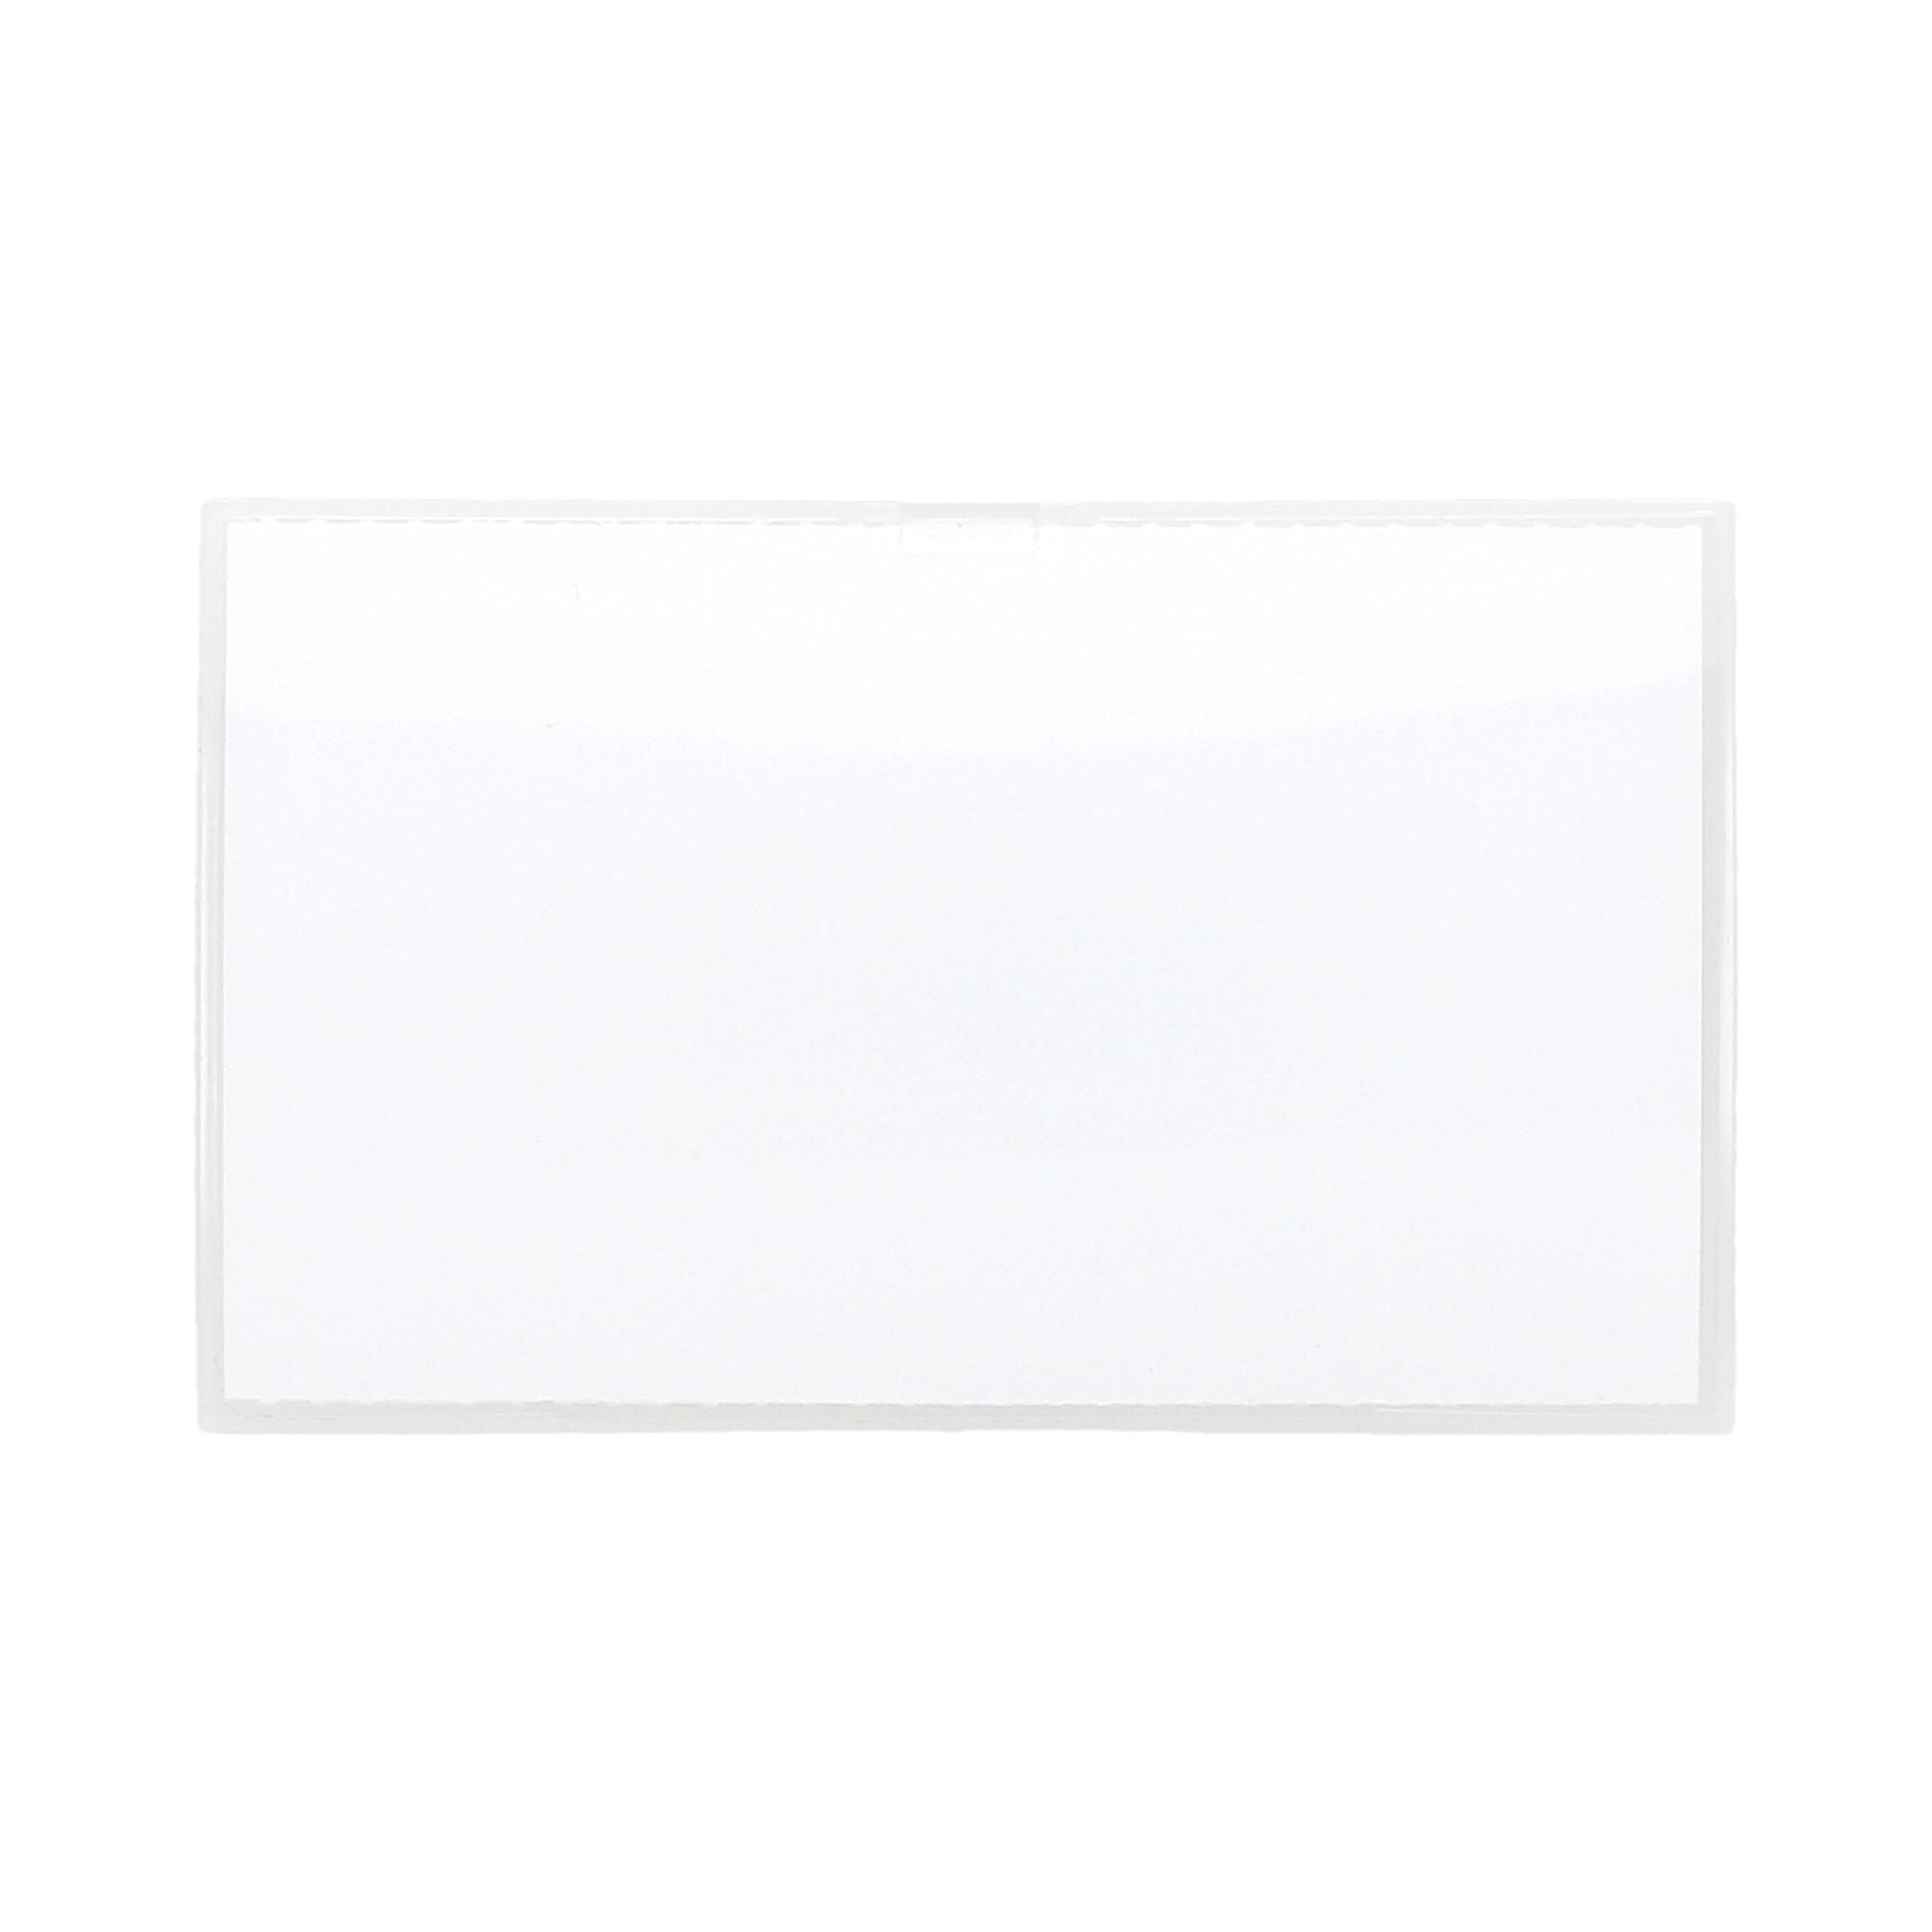 Identyfikator 54x90 Click Fold magnes Durable